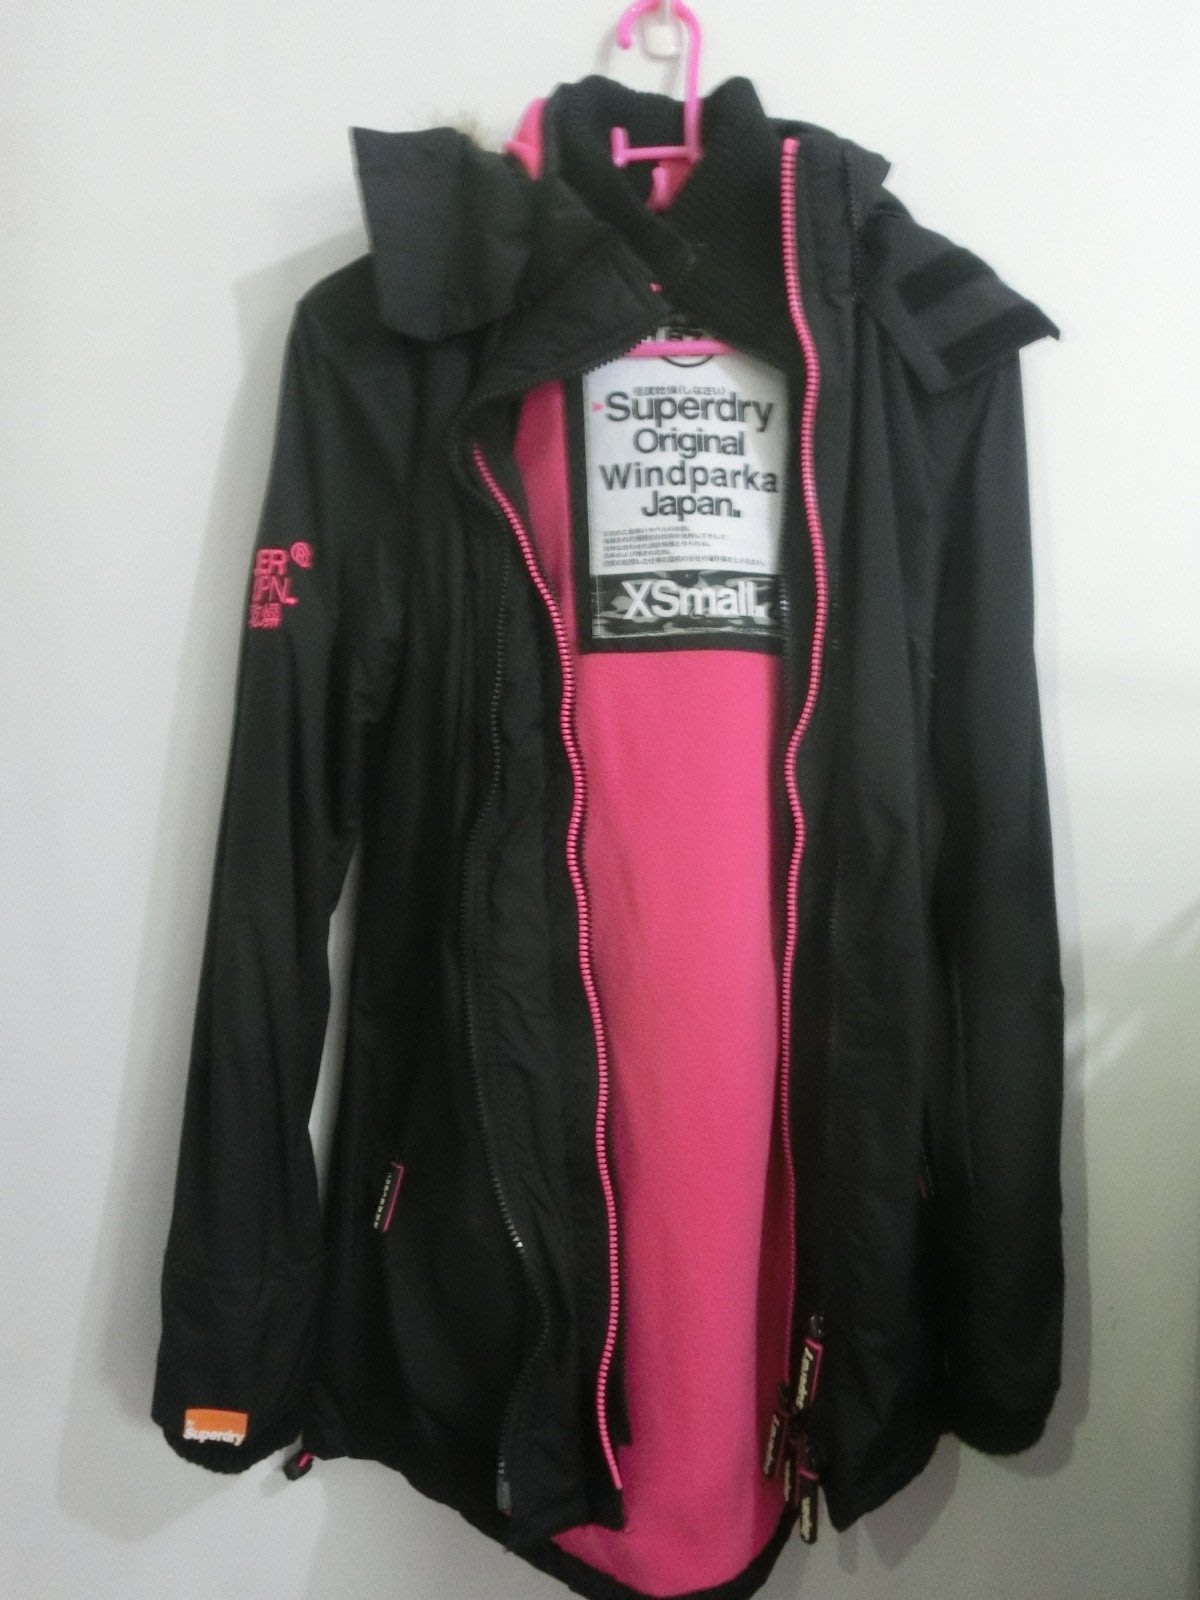 Superdry Original Windparka Japan 黑色 連帽防風外套 XS